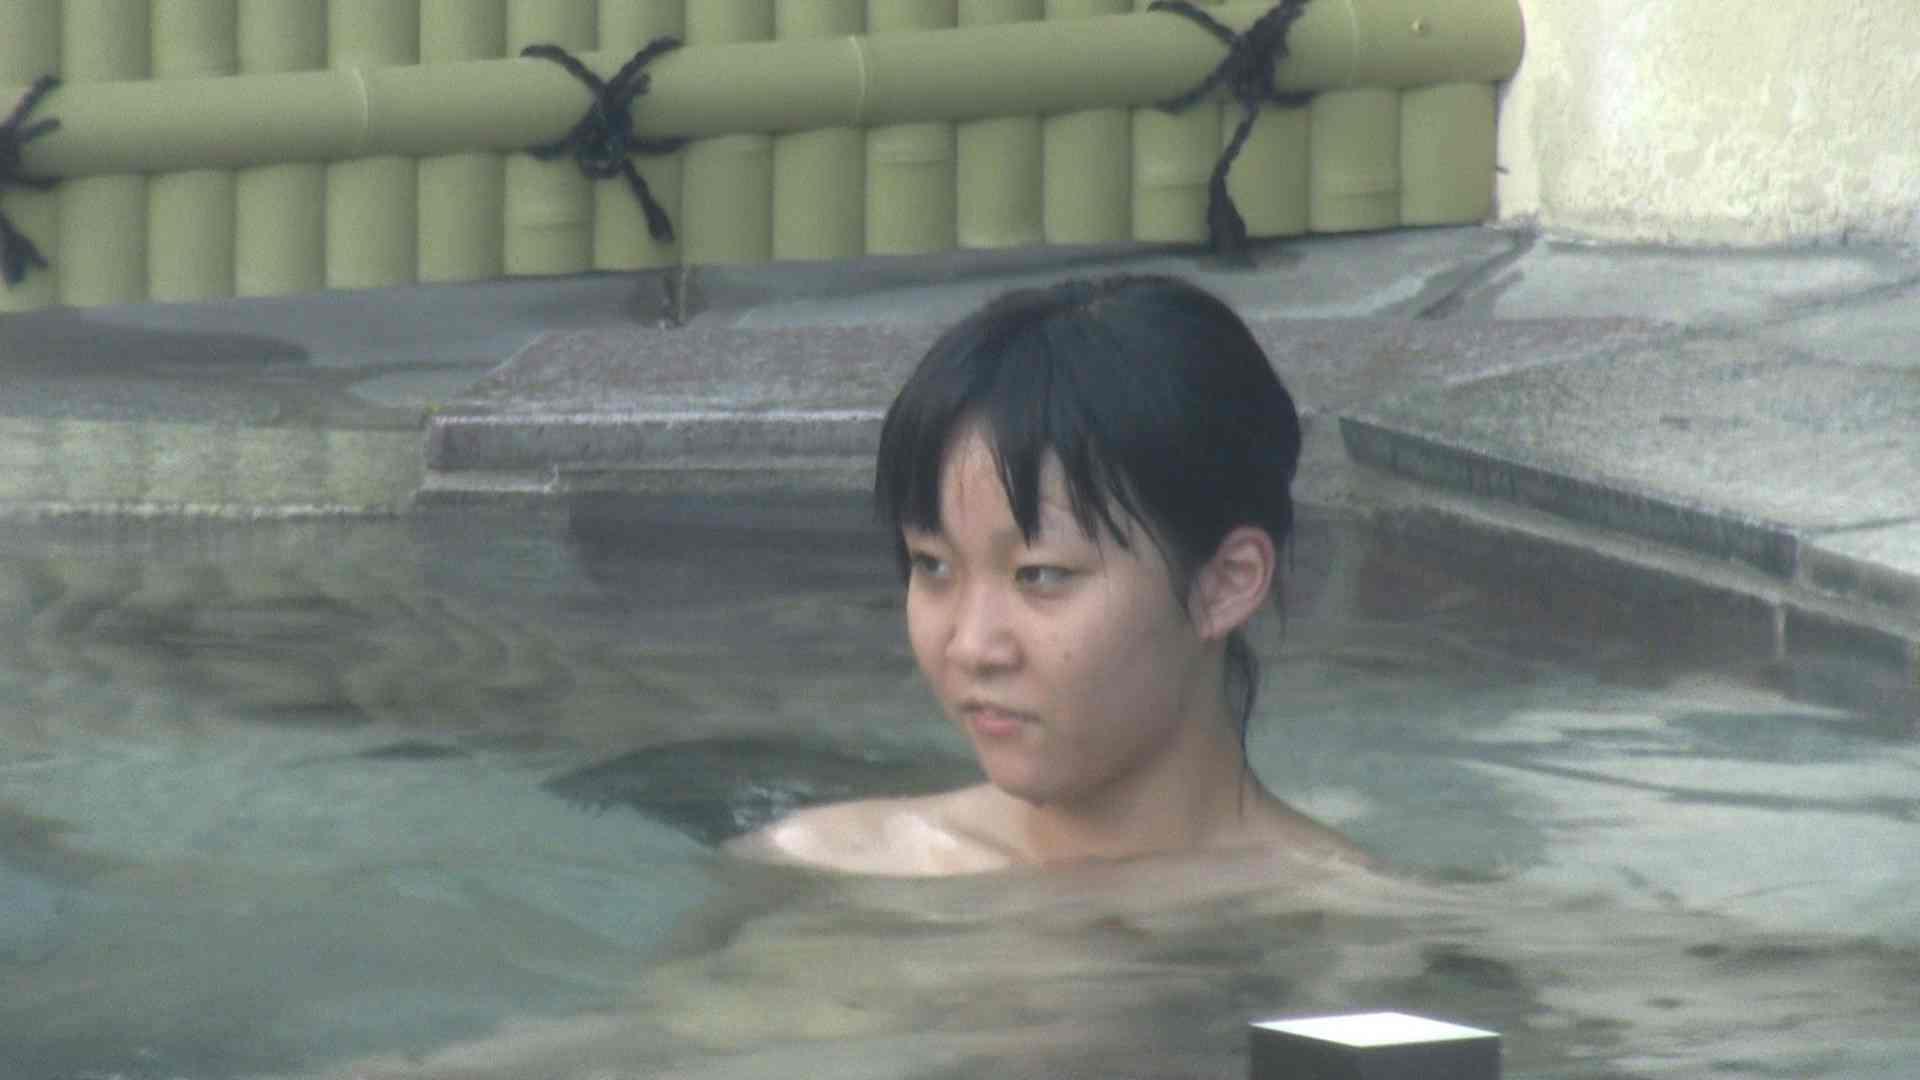 Aquaな露天風呂Vol.196 盗撮シリーズ | 露天風呂編  87PIX 17